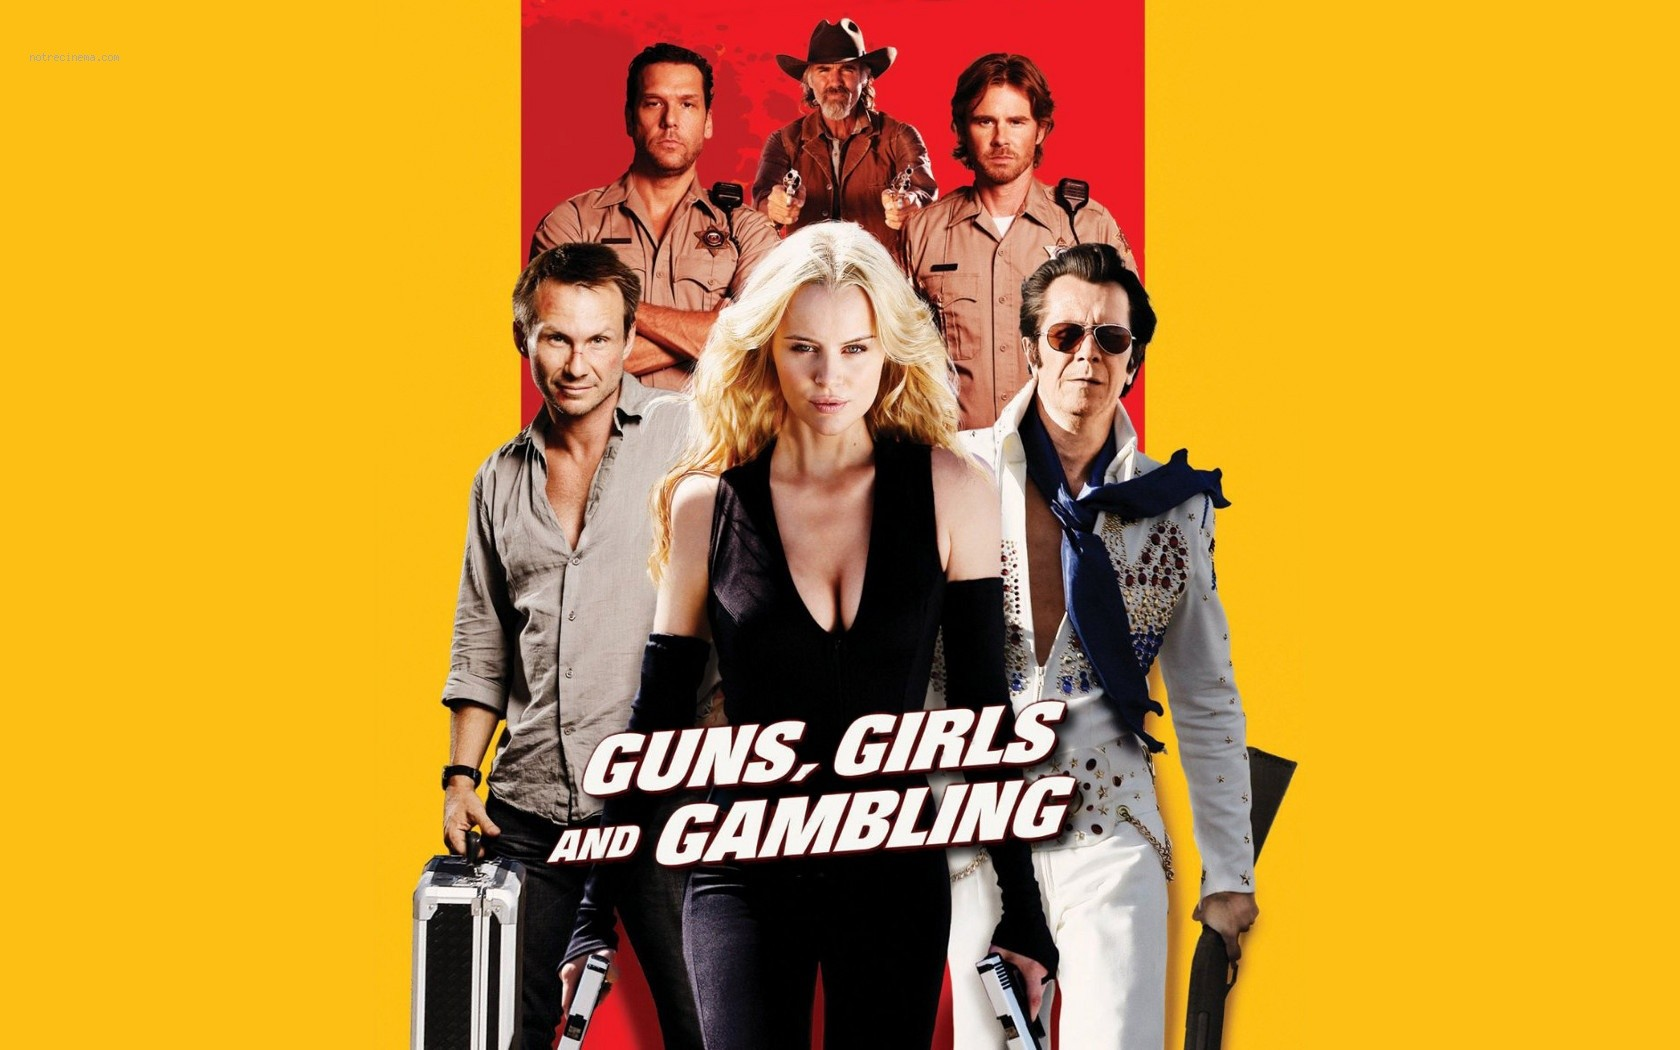 Pištolj, djevojke i kockanje